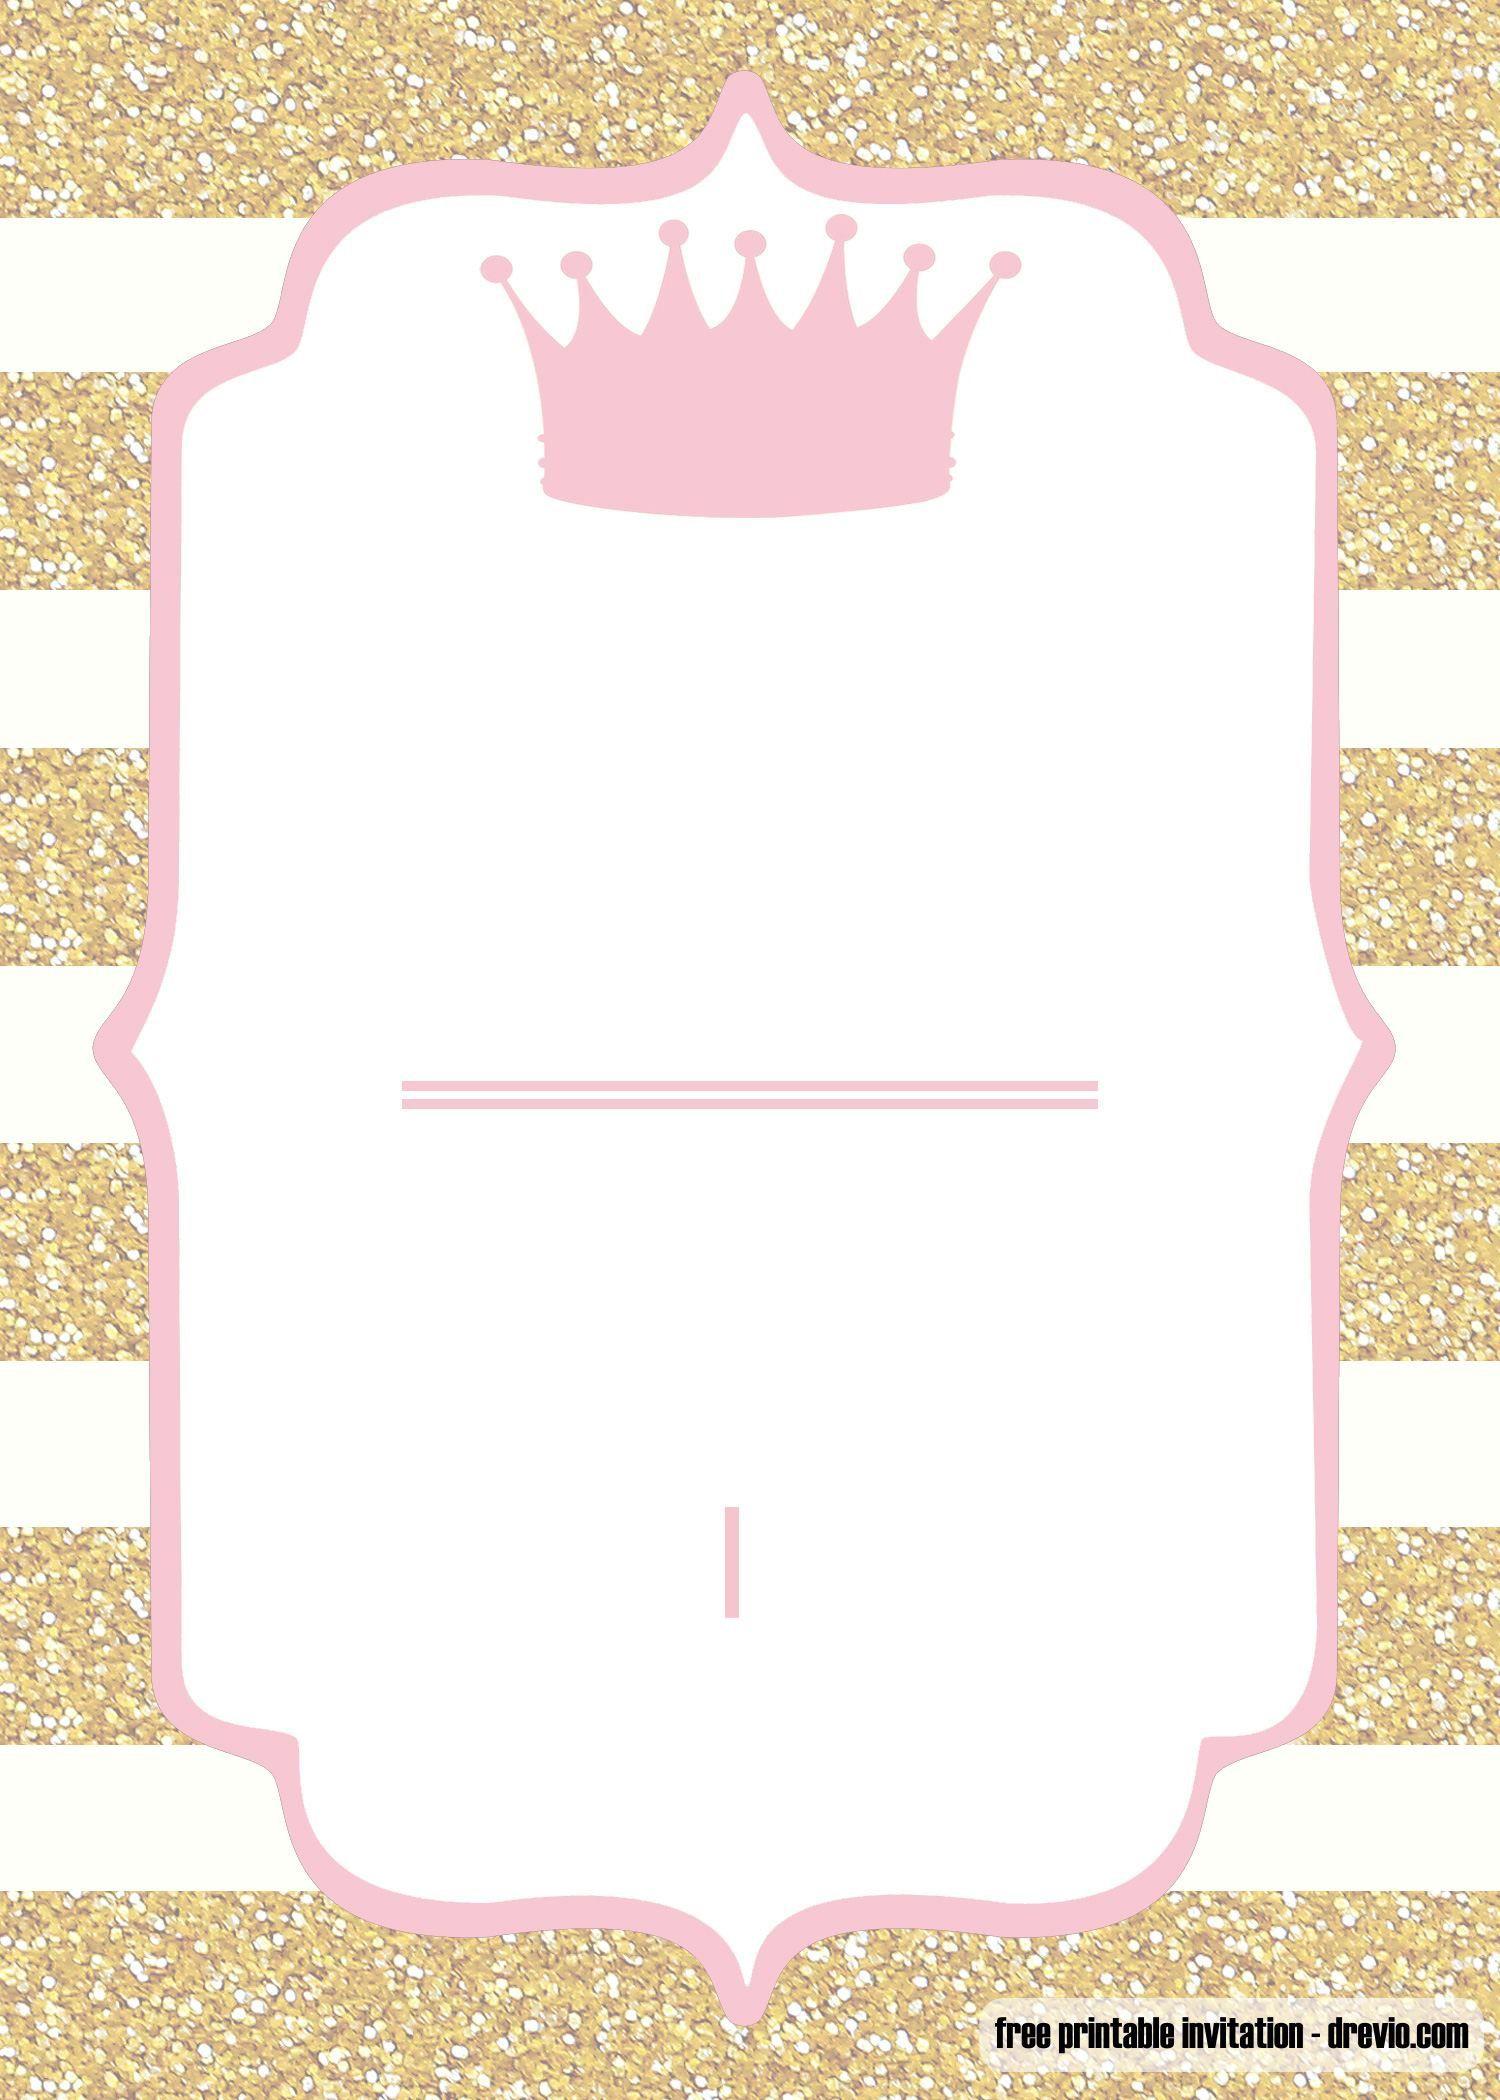 009 Shocking Baby Shower Template Free Printable Design  Superhero Invitation For A Boy DiaperFull